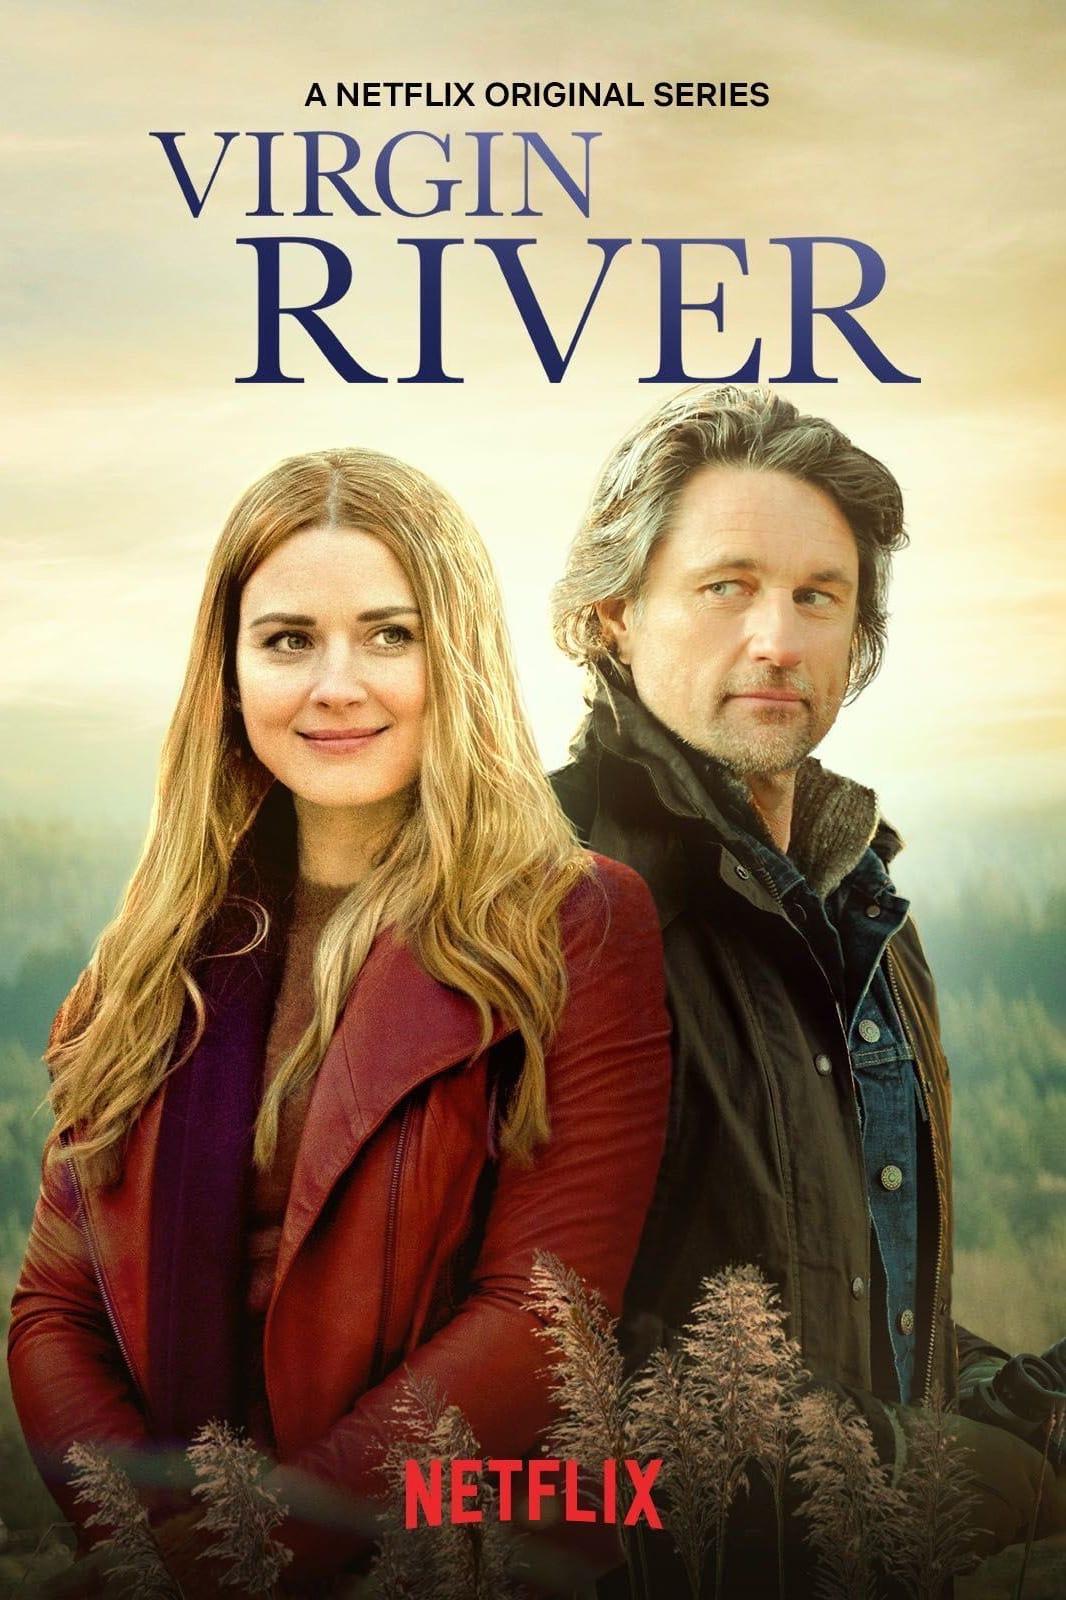 11 - Virgin River